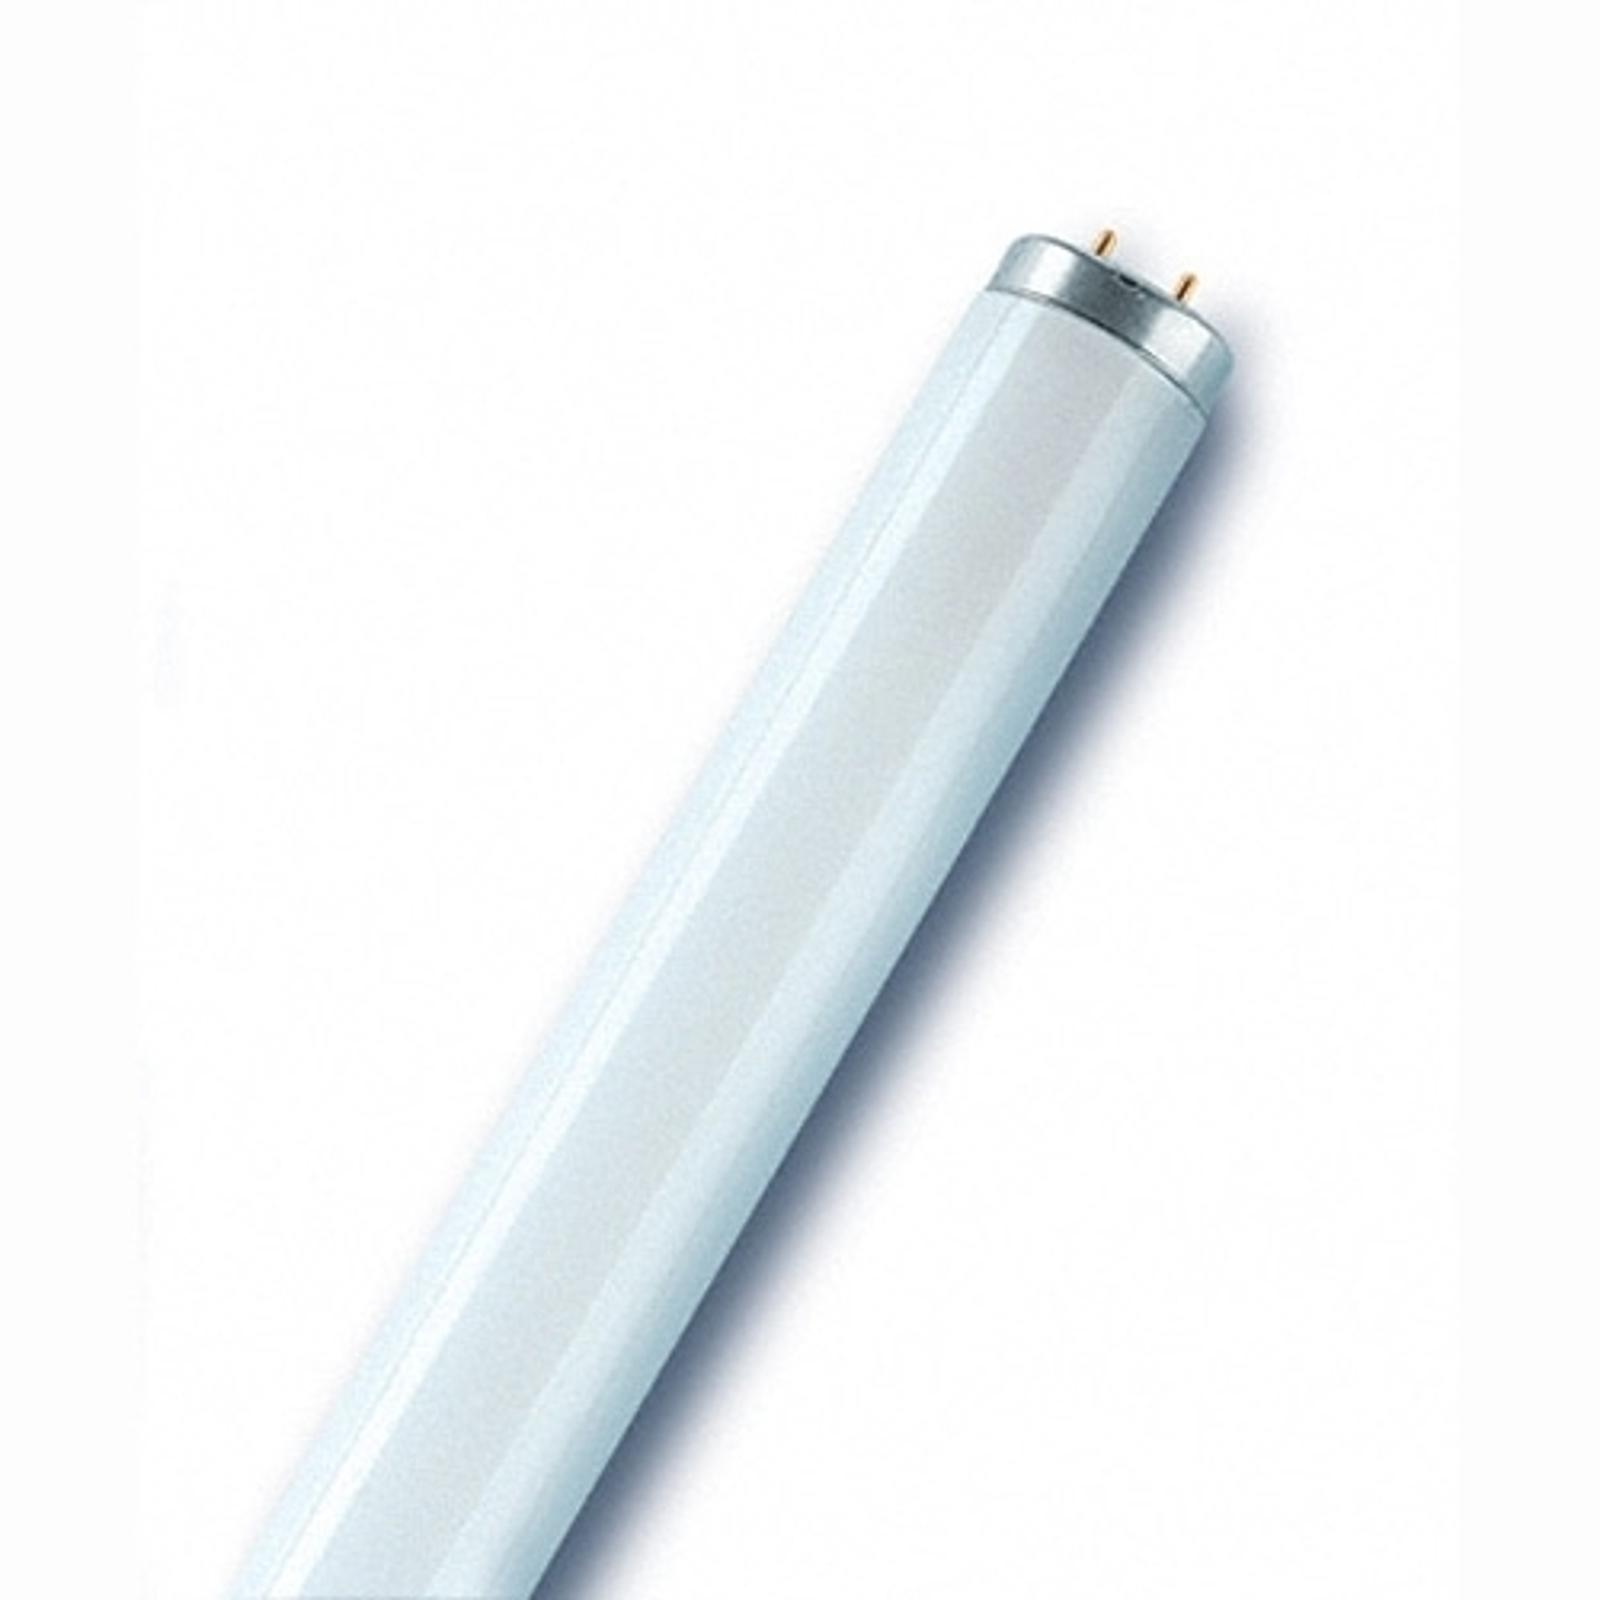 G13 T12 40W lysstoffpære SA-modell